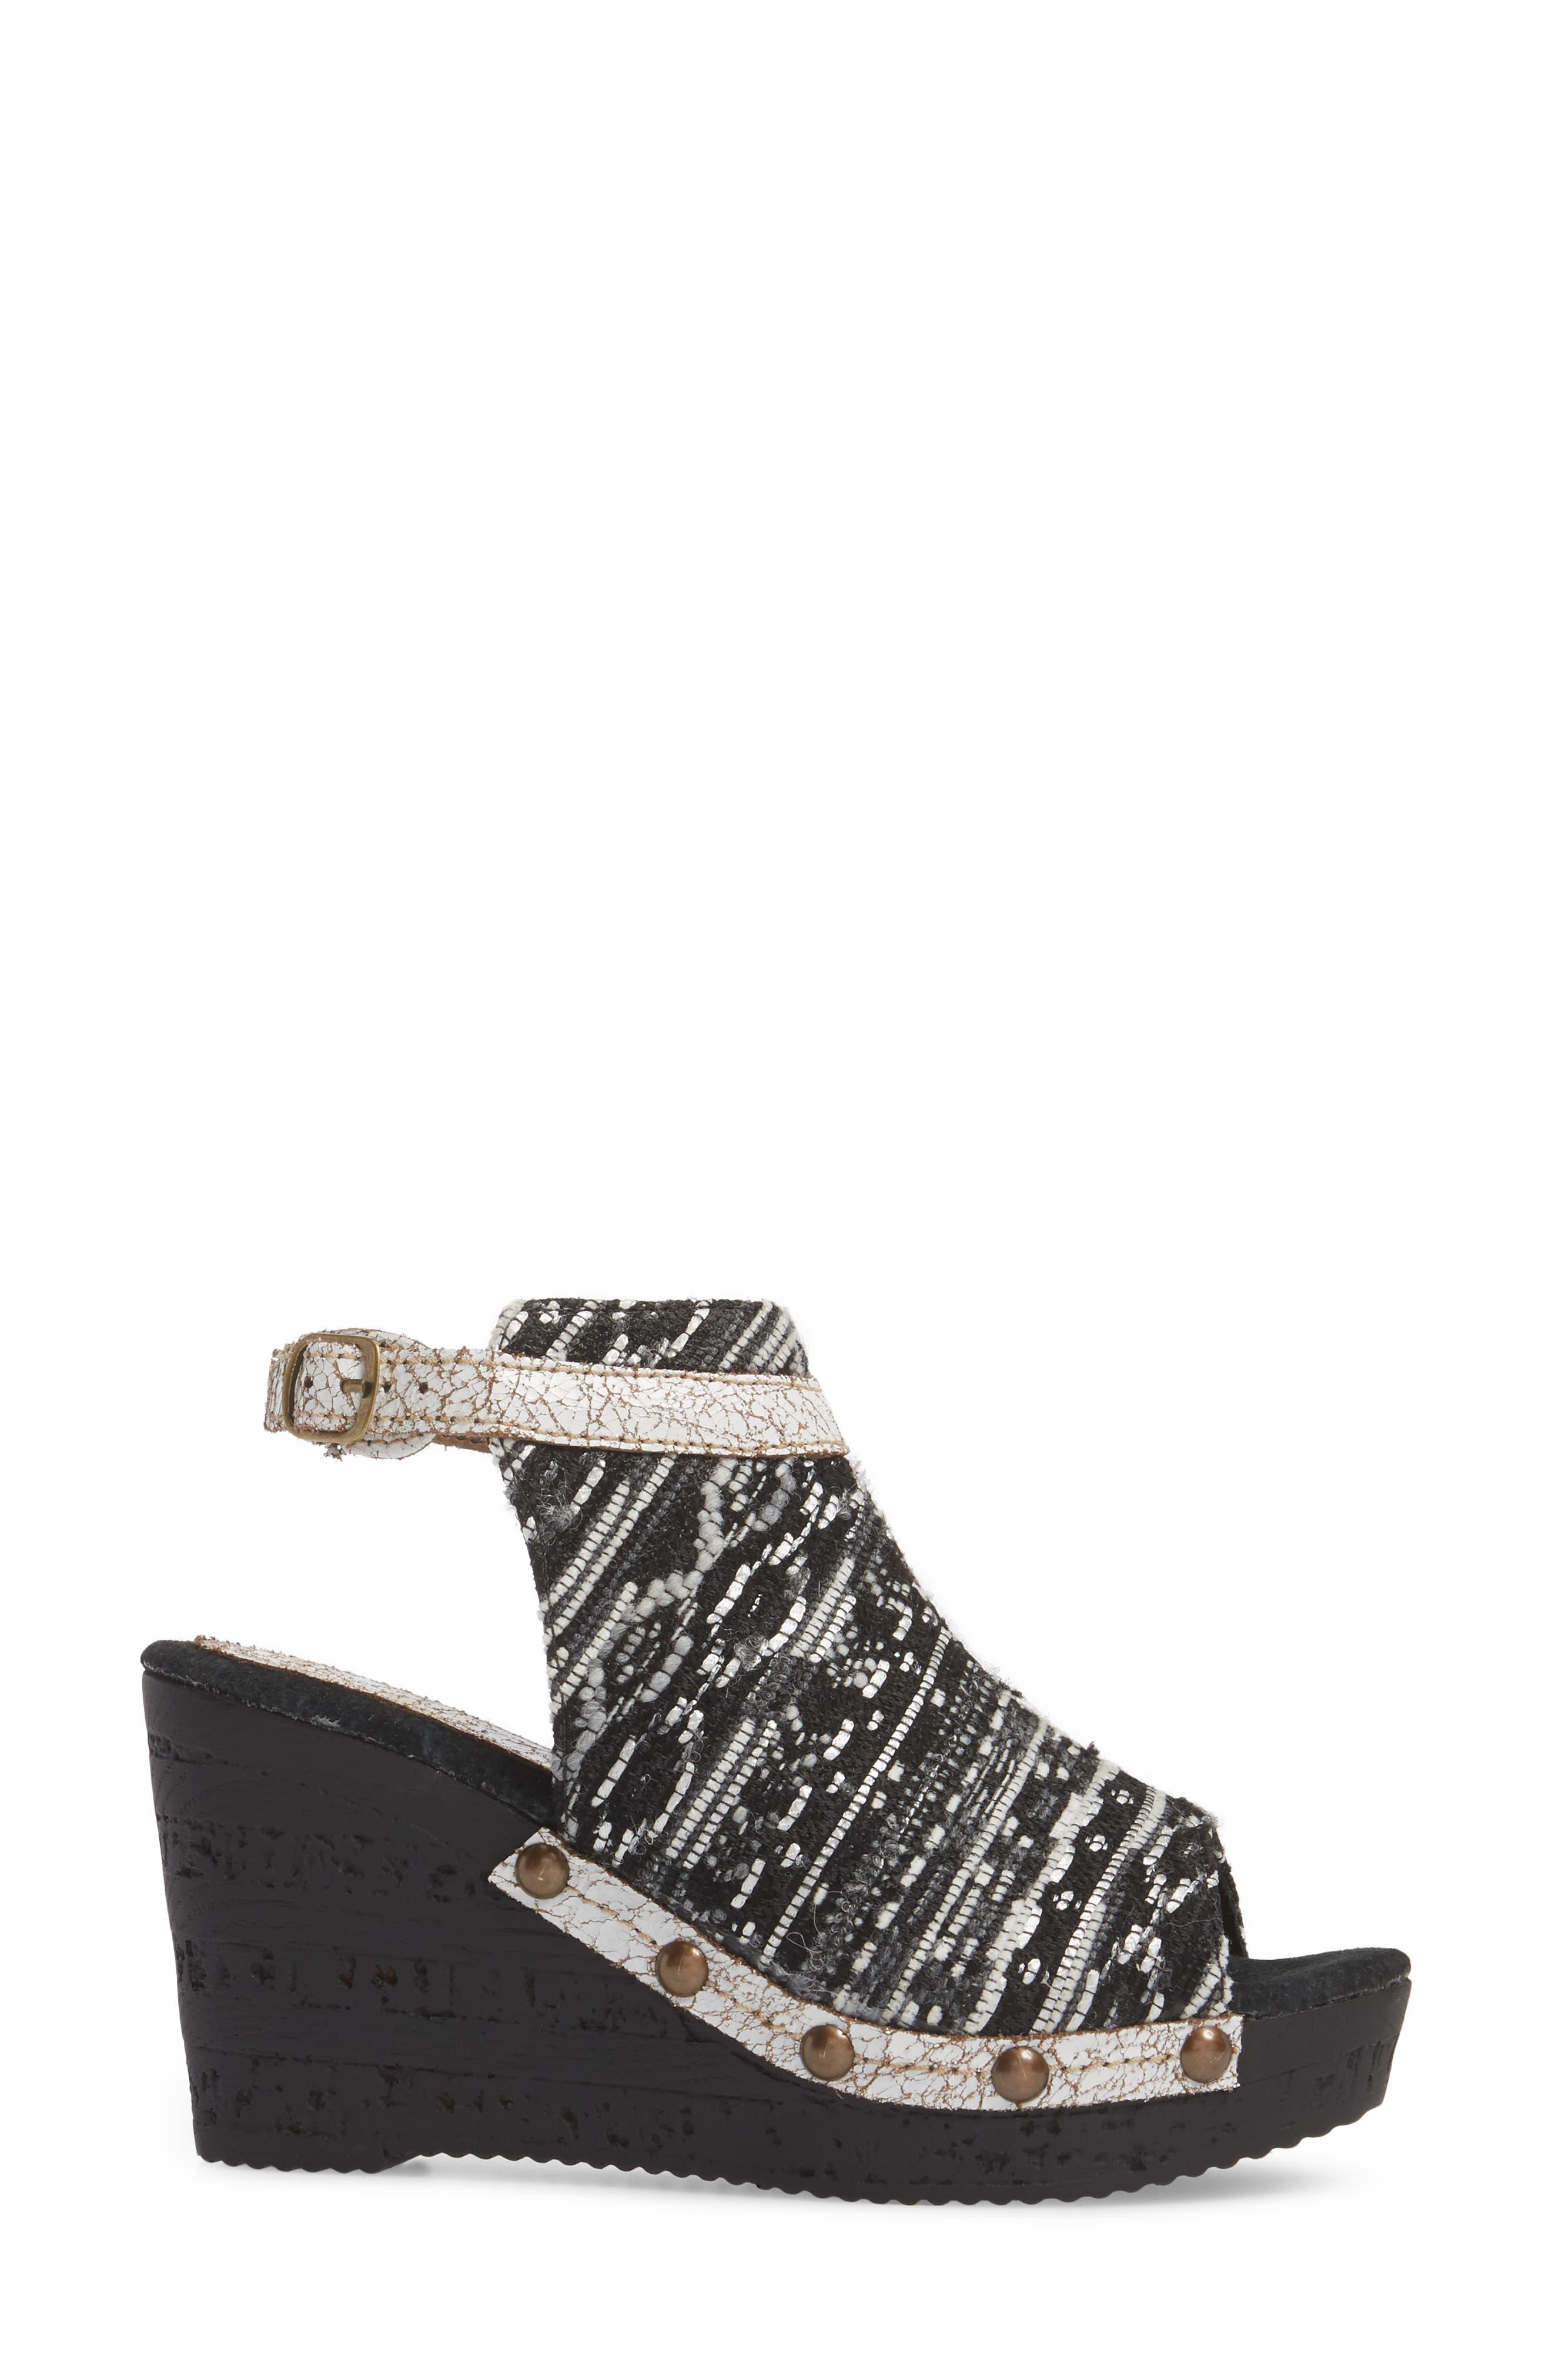 SBICCA,                             Sabari Peep Toe Wedge Sandal,                             Alternate thumbnail 3, color,                             001